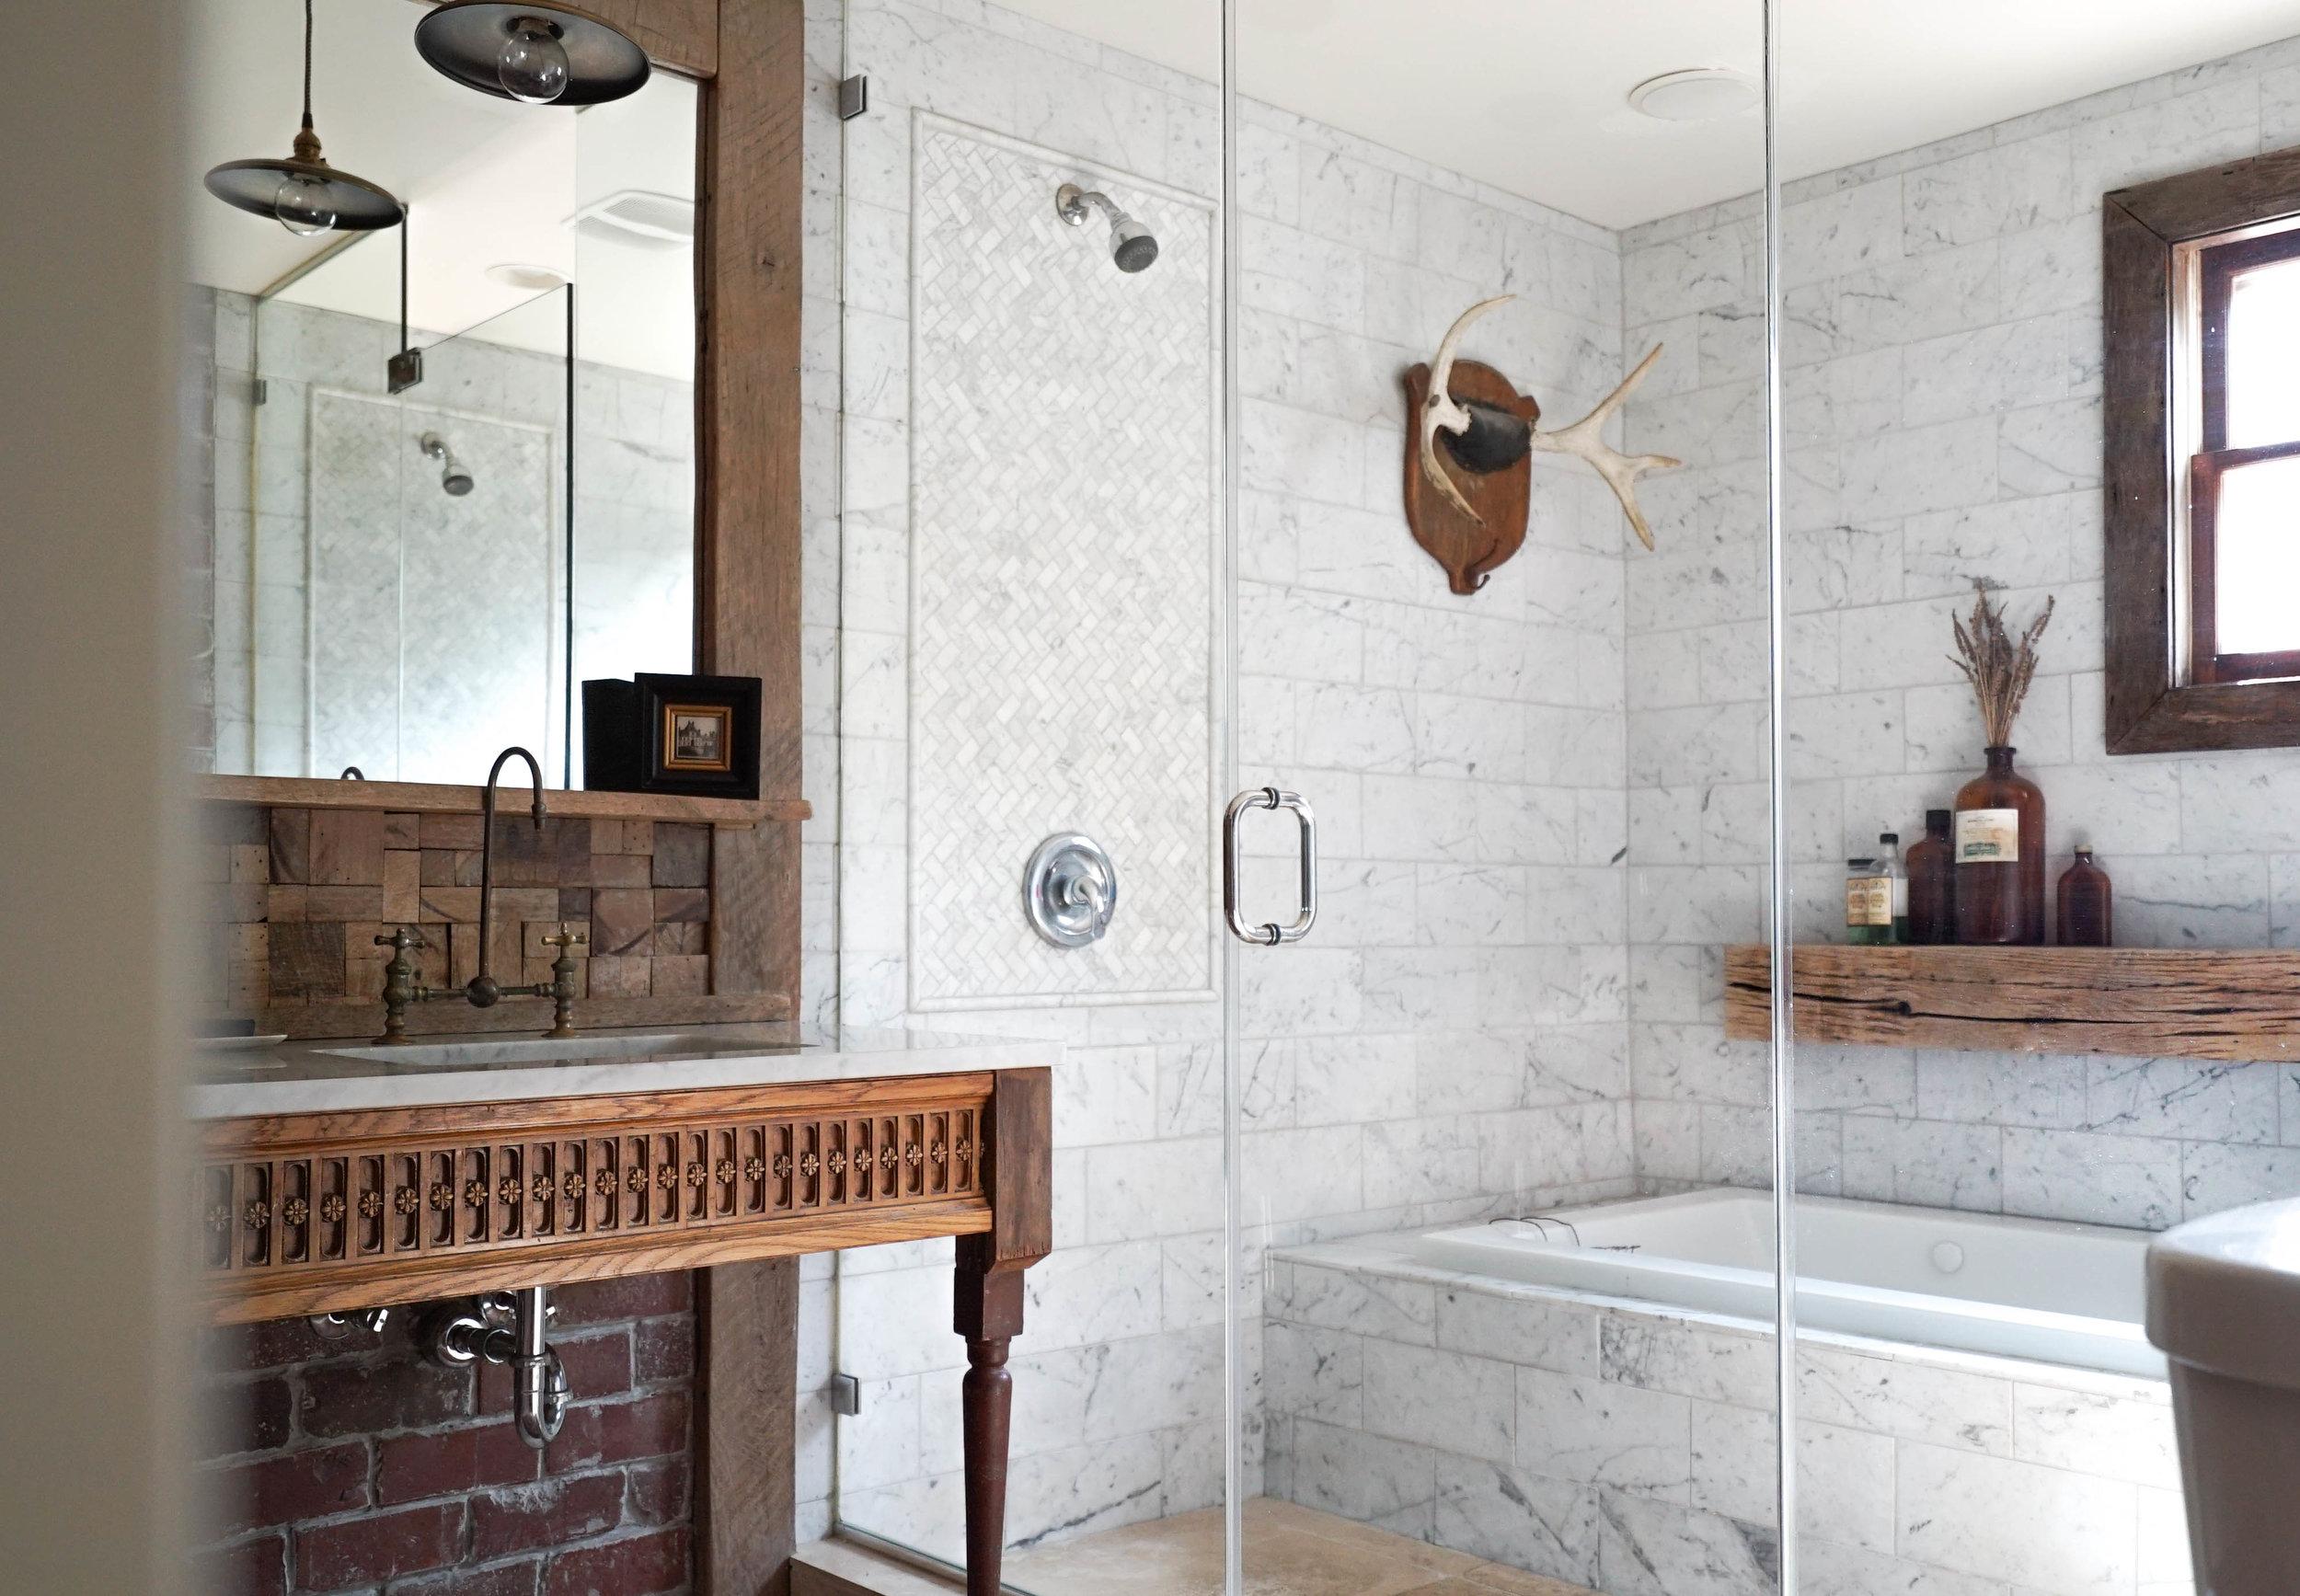 KF_bathroom peaking from door.jpg